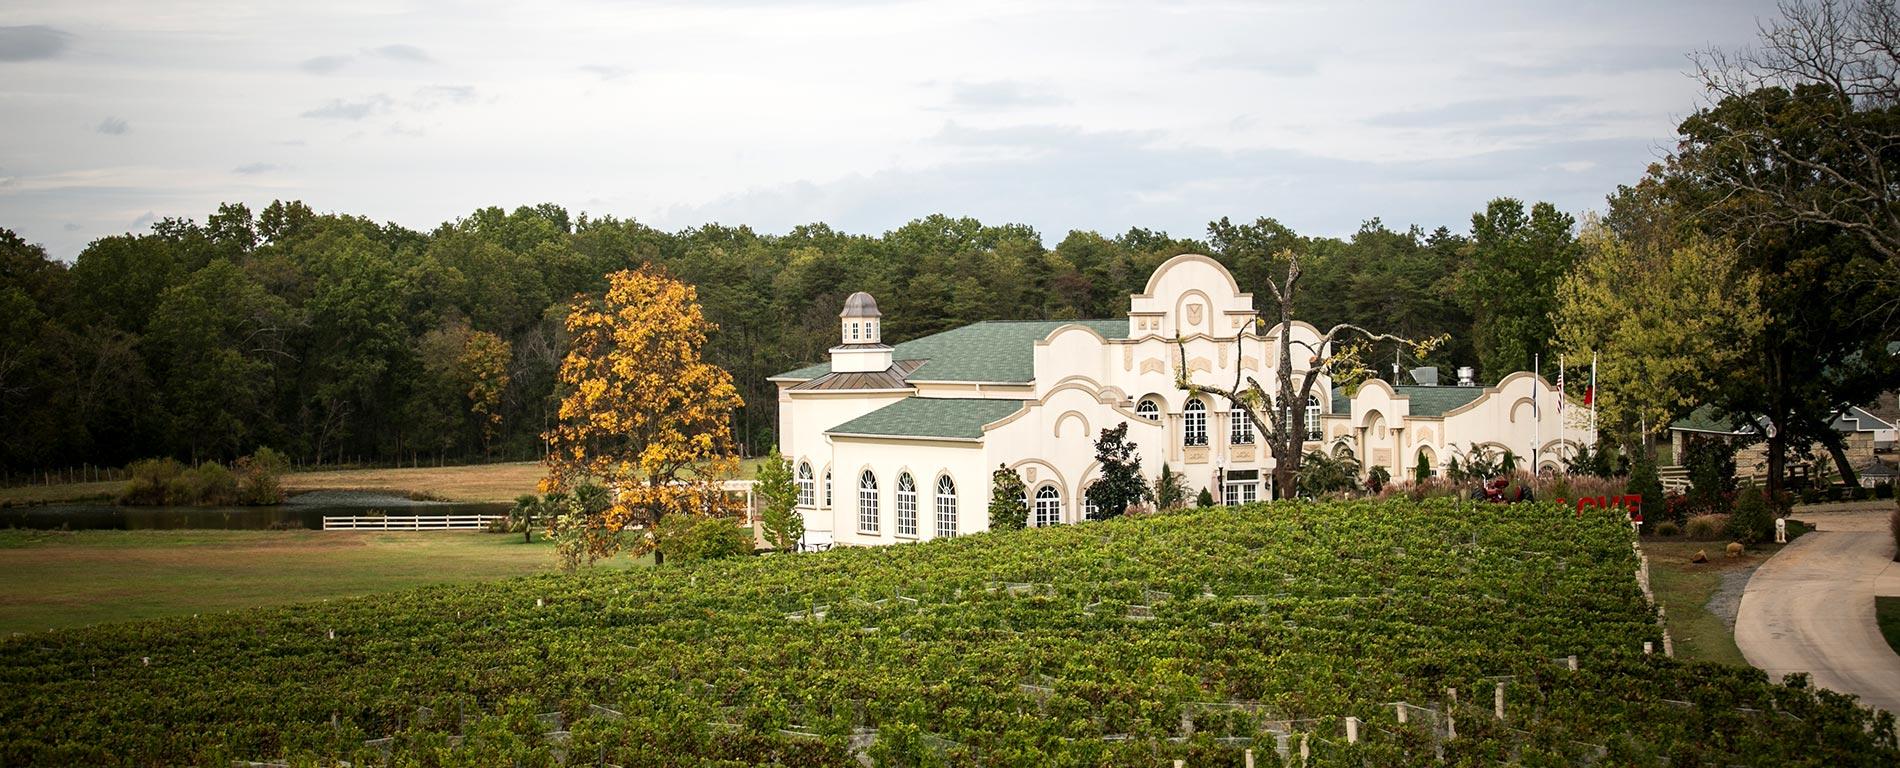 moraisvinyards-home-slider-the-winery-outside Home